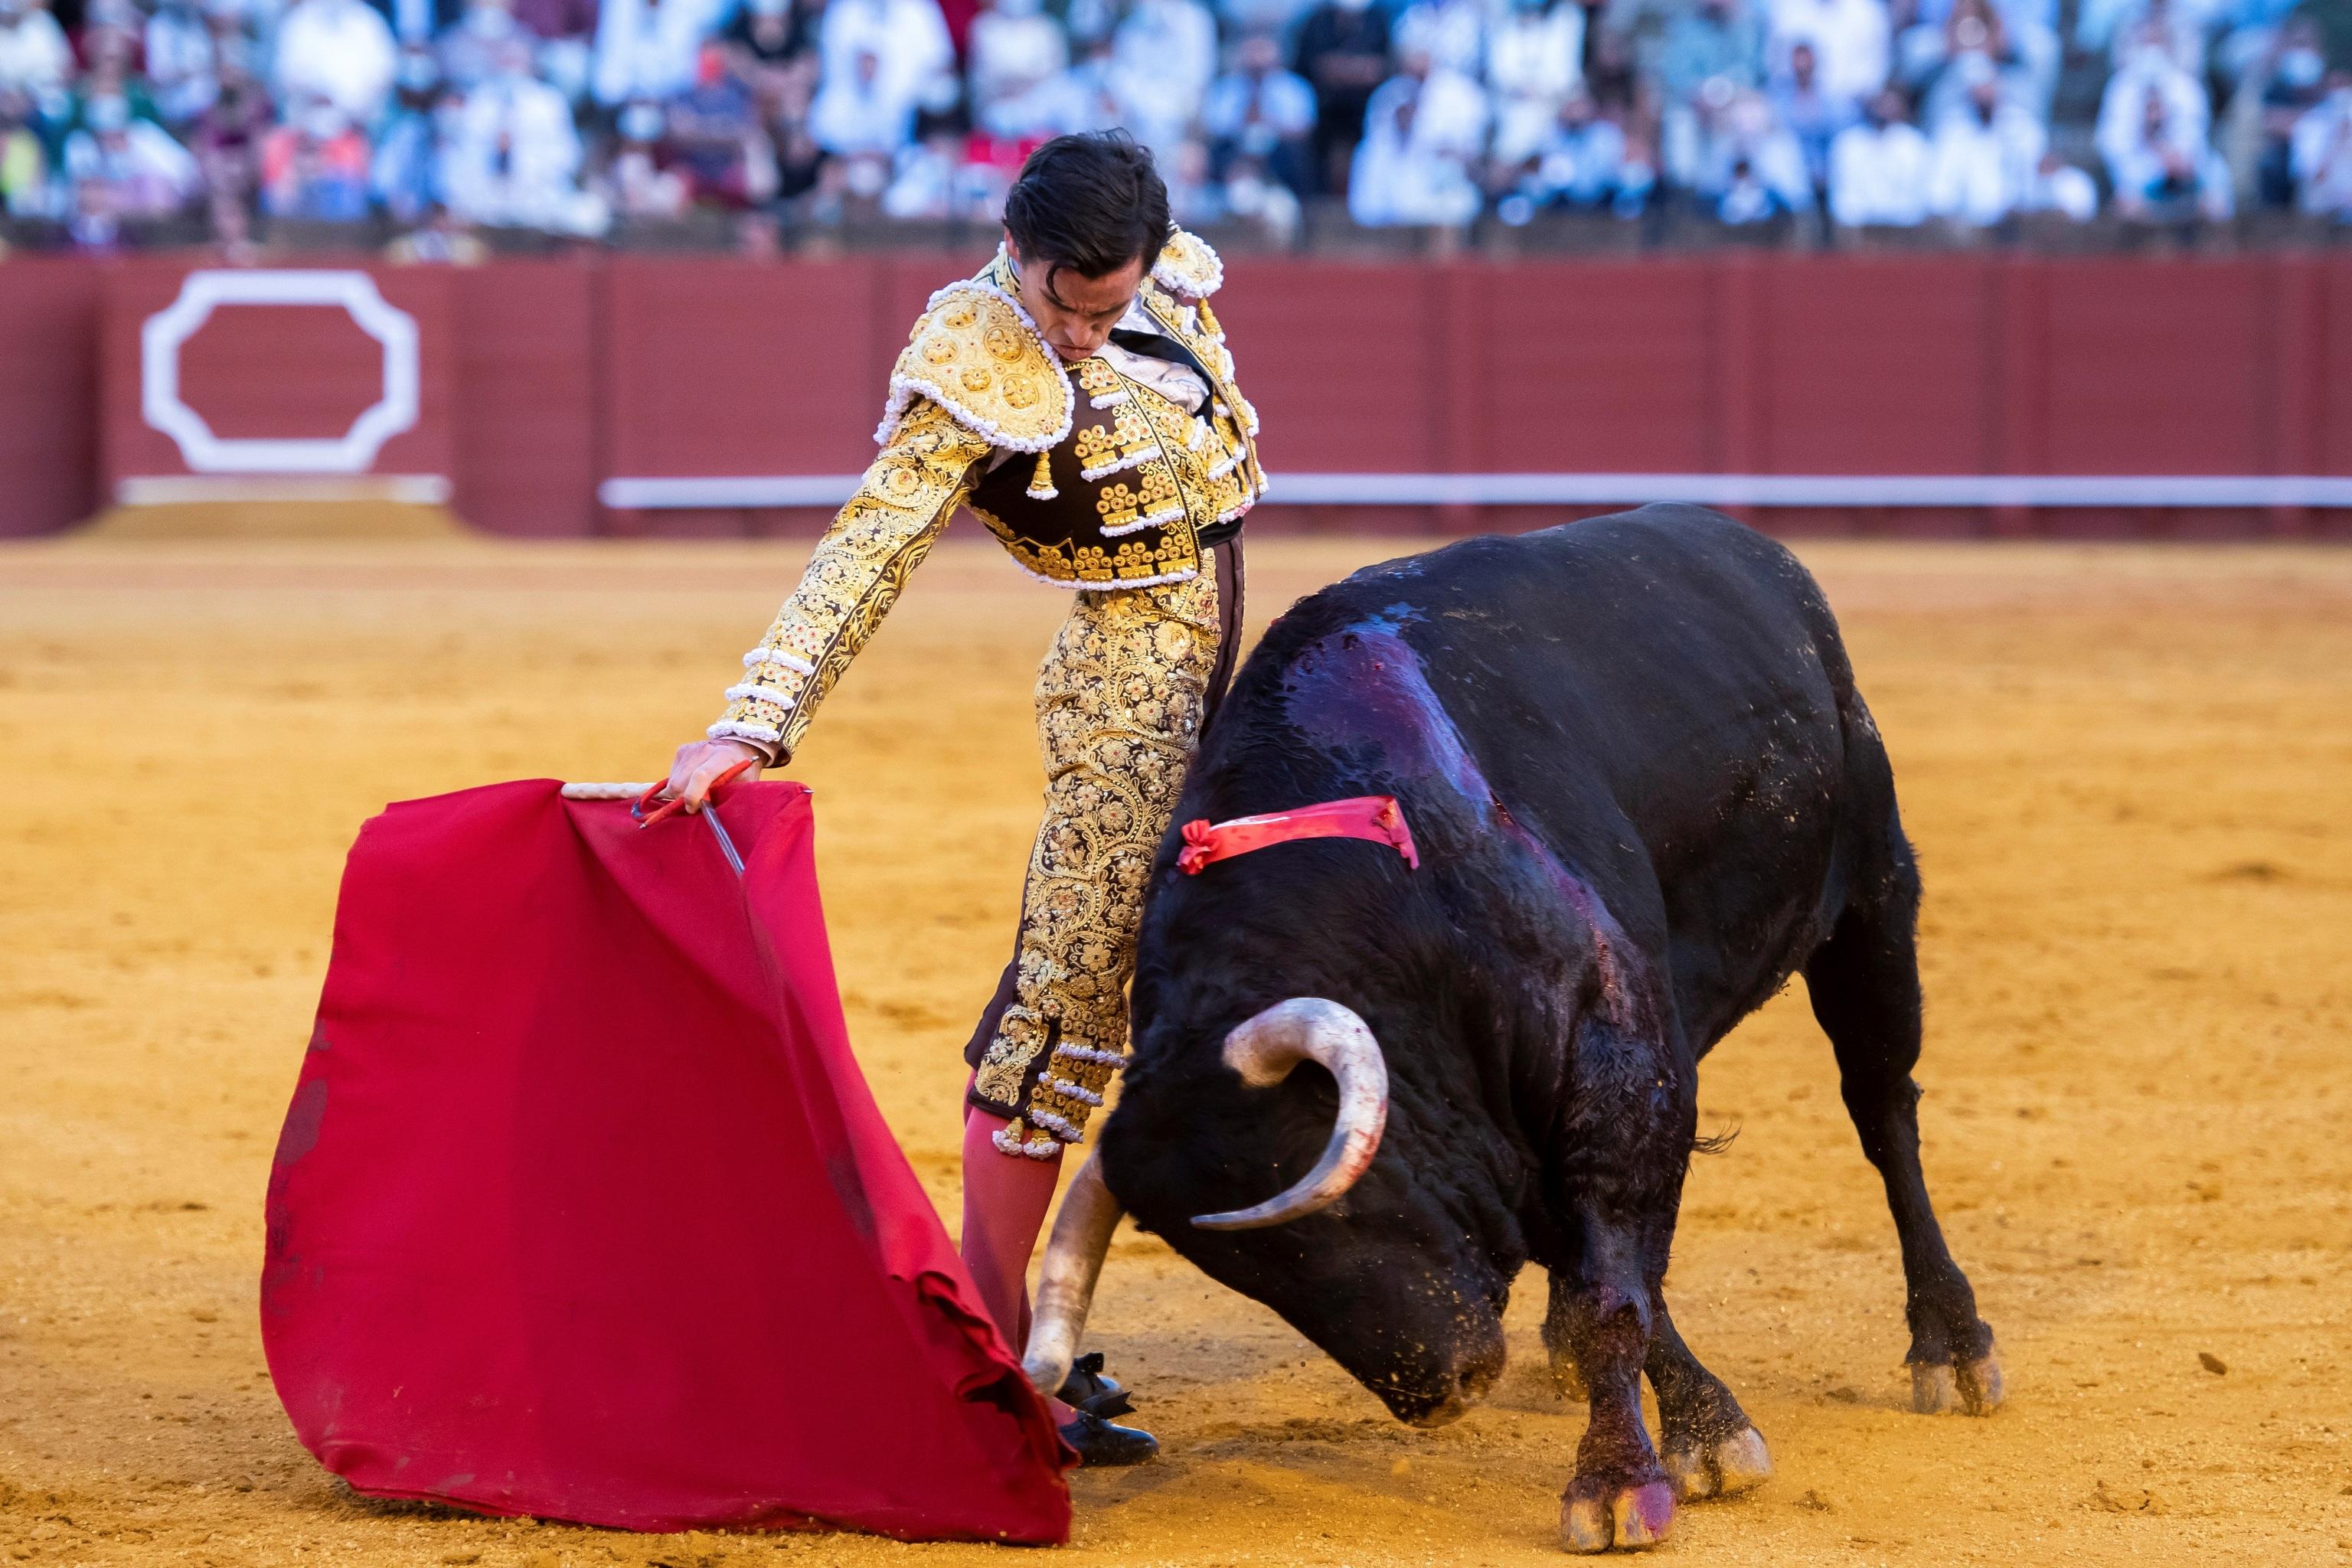 Juan Ortega envenena Sevilla